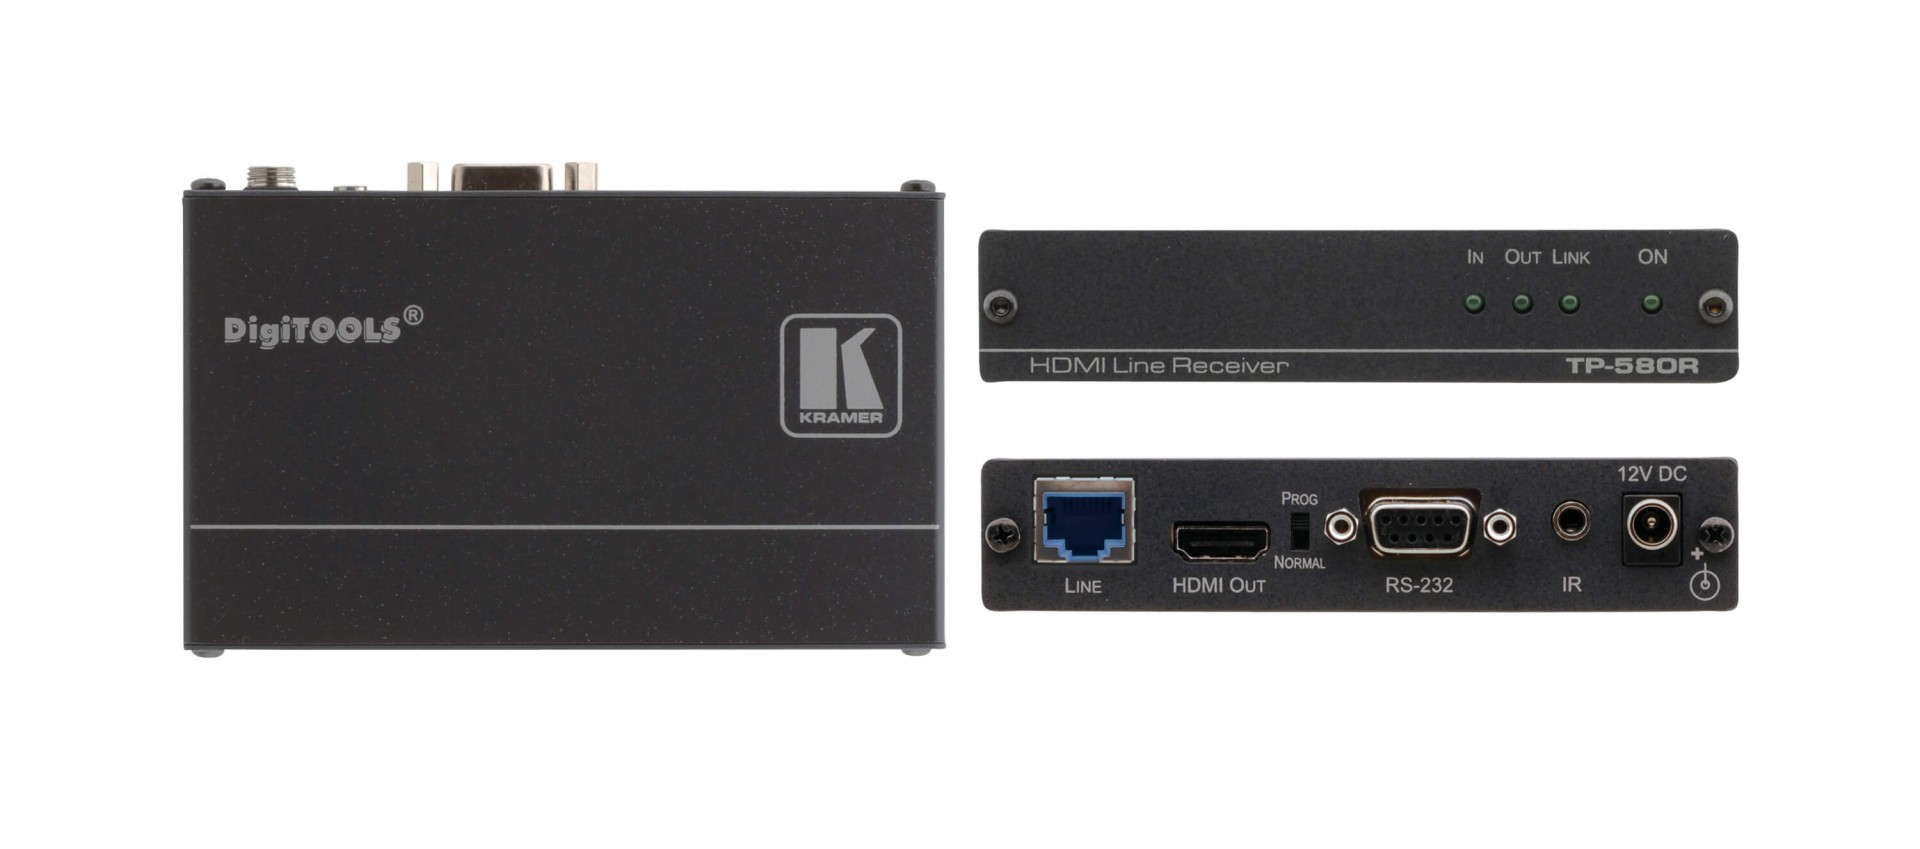 Kramer TP-580R - 4K60 4:2:0 HDMI HDCP 2.2 Receiver